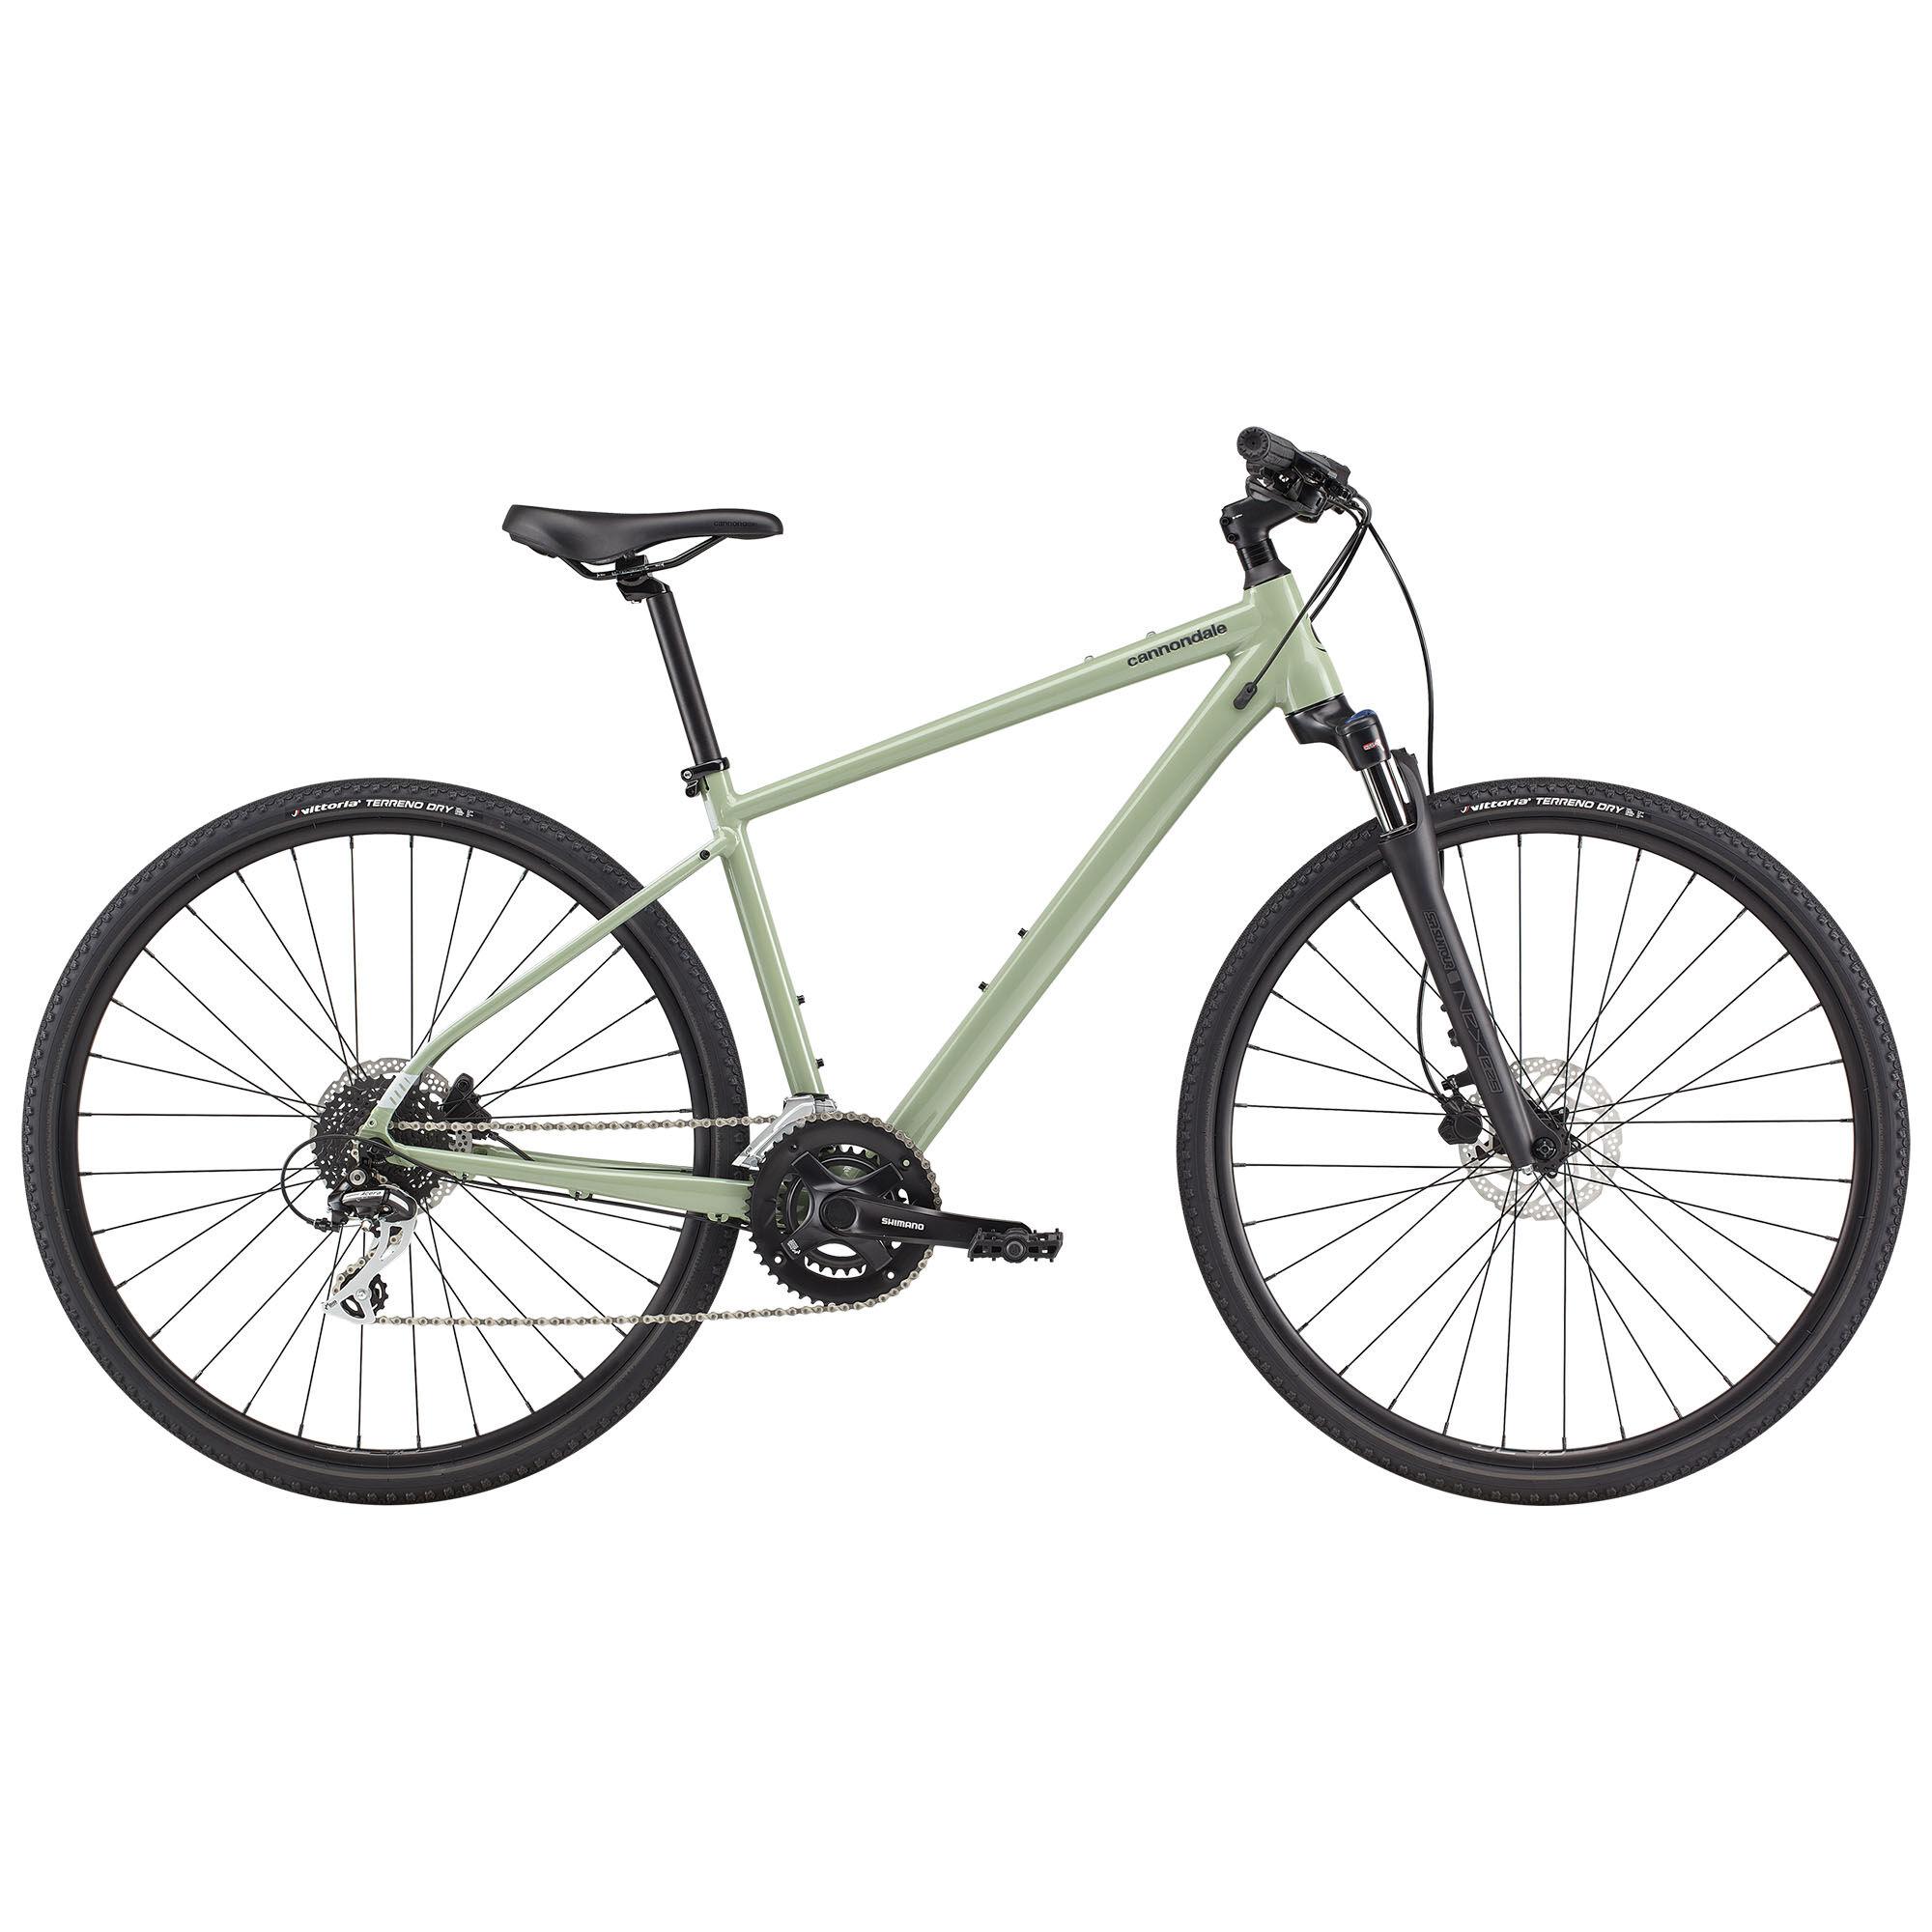 Cannondale Men's Quick CX 3 Urban Bike '21  - Agave - Size: Large